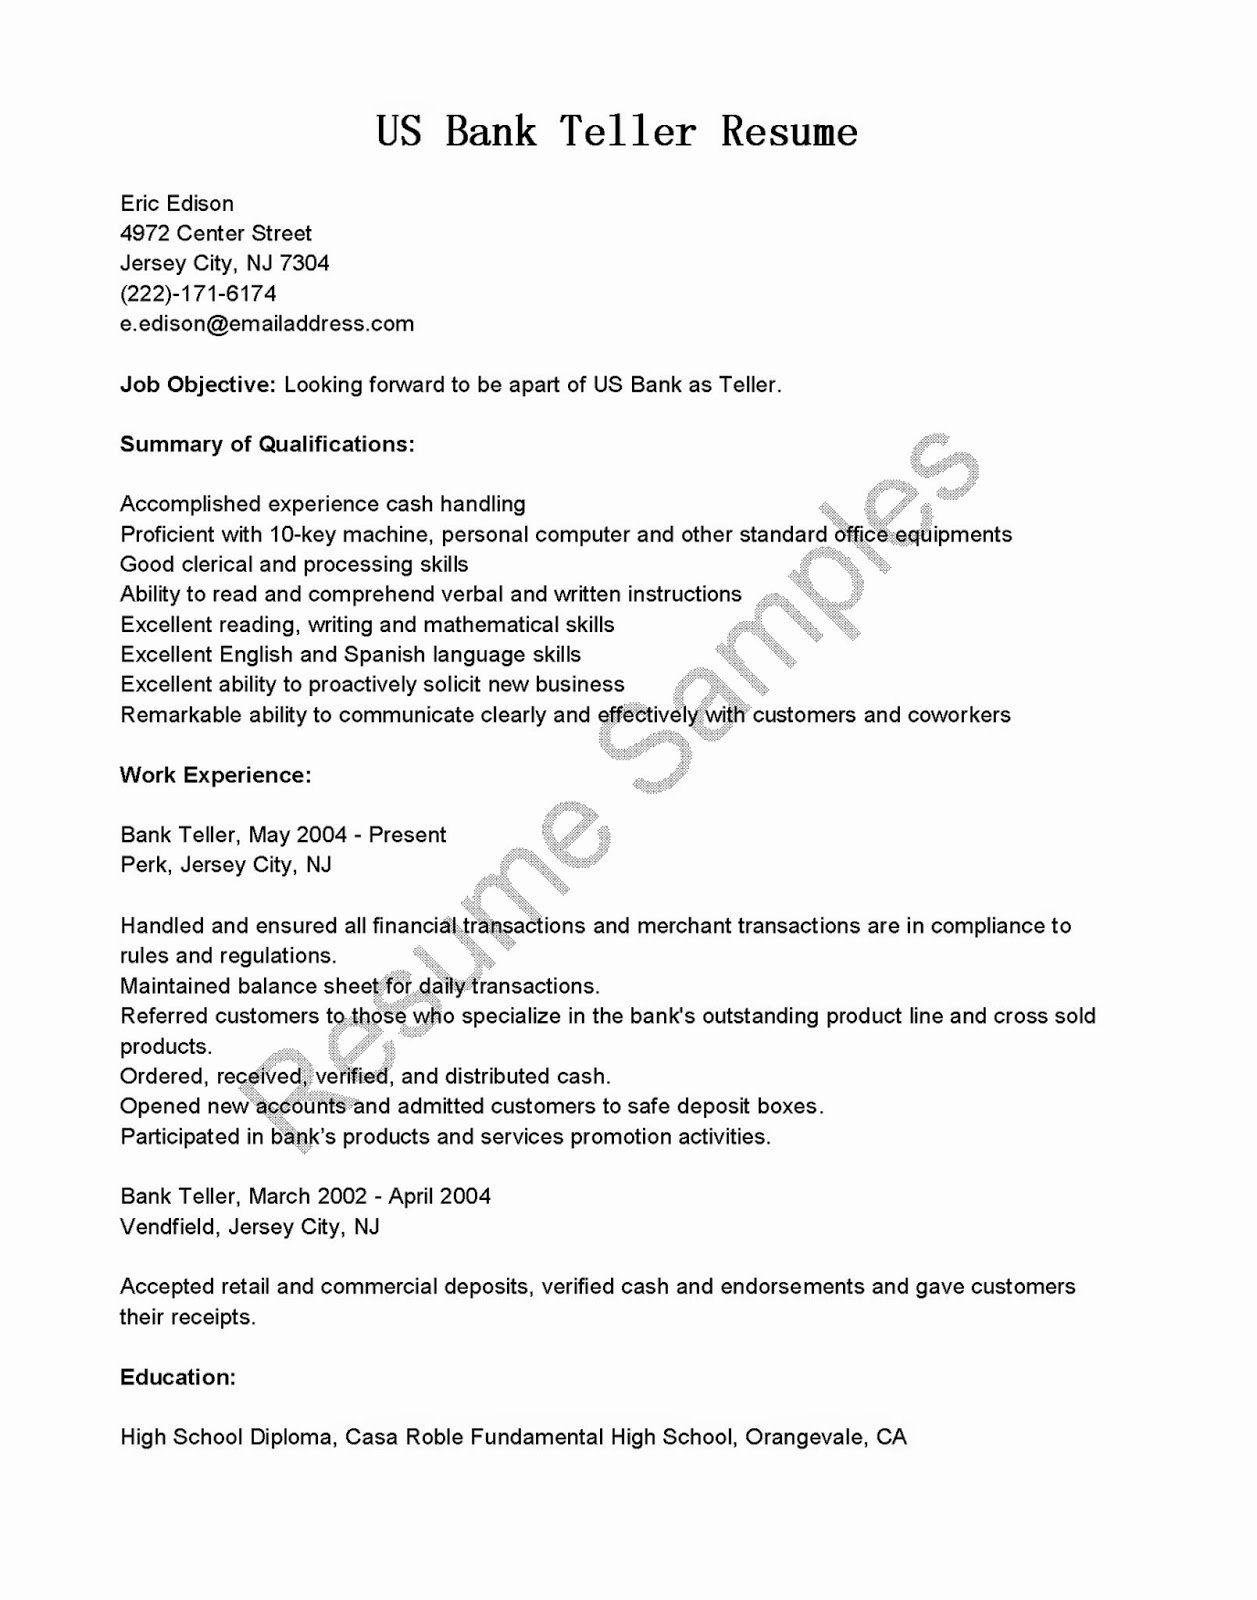 20 Bank Teller Job Description Resume in 2020 Bank